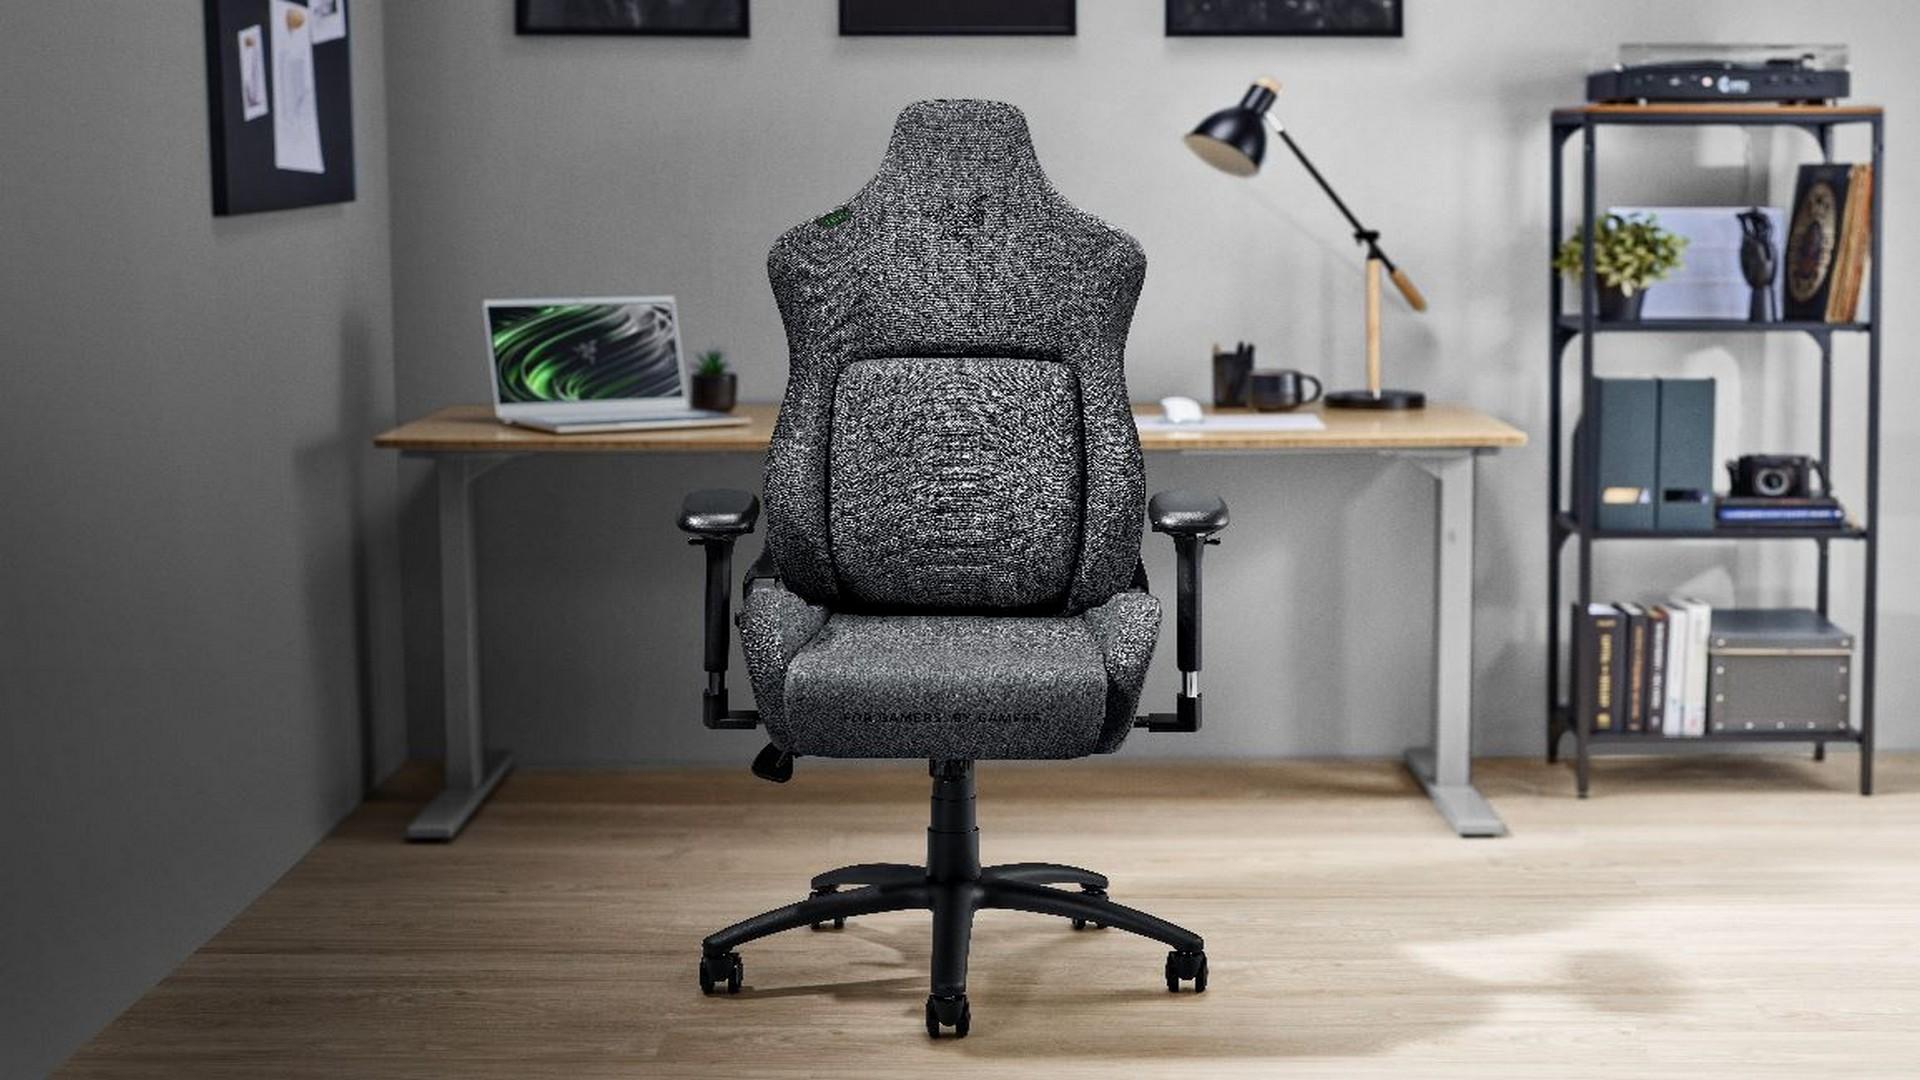 Razer Introduces New Fabric Ergonomic Gaming Chairs To The Razer Iskur Family